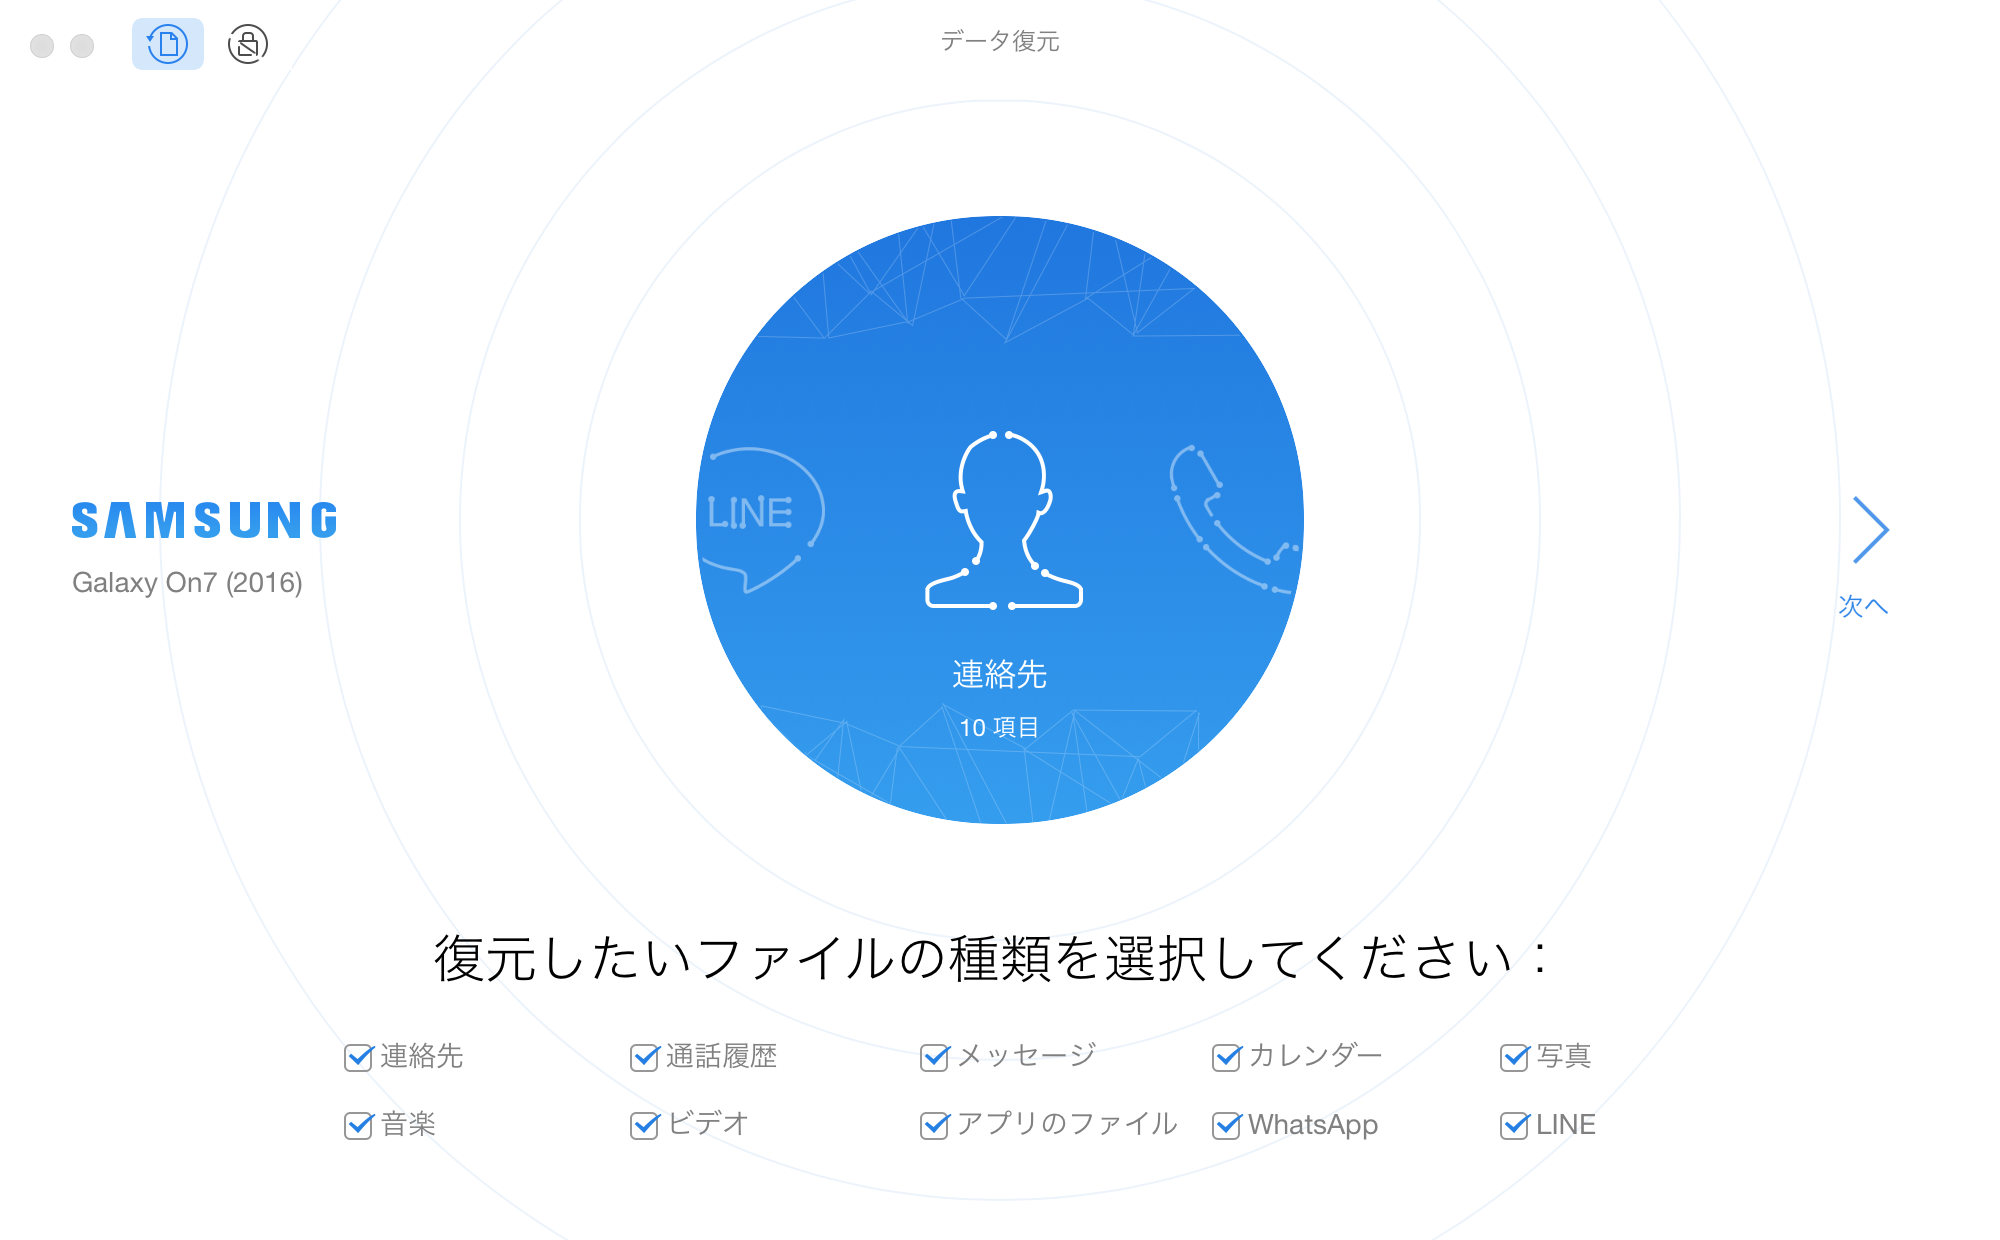 PhoneRescue - SAMSUNGデータ復元のホーム画面